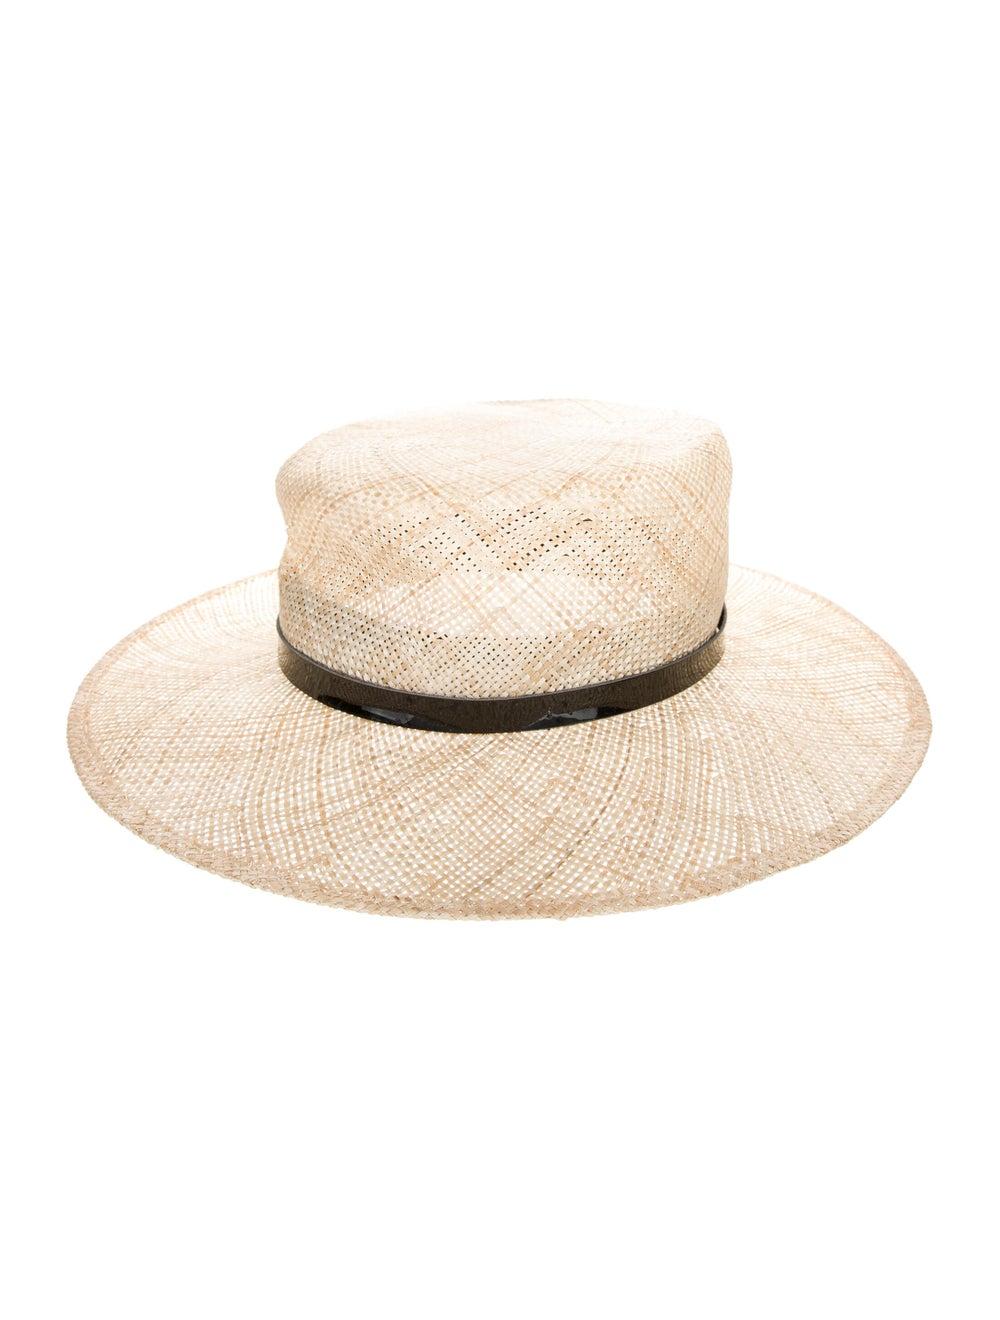 Janessa Leone Straw Hat black - image 1